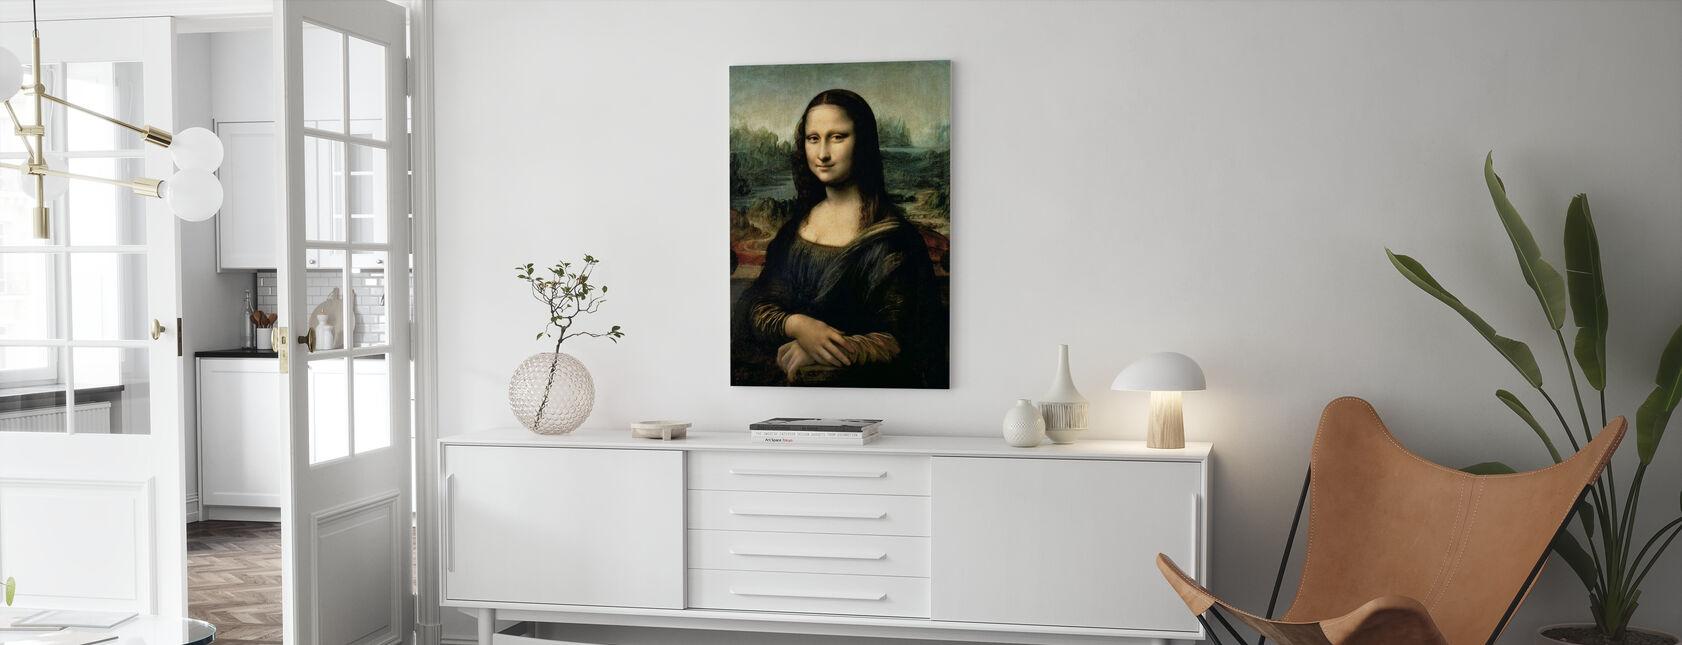 Mona Lisa, Leonardo da Vinci - Leinwandbild - Wohnzimmer